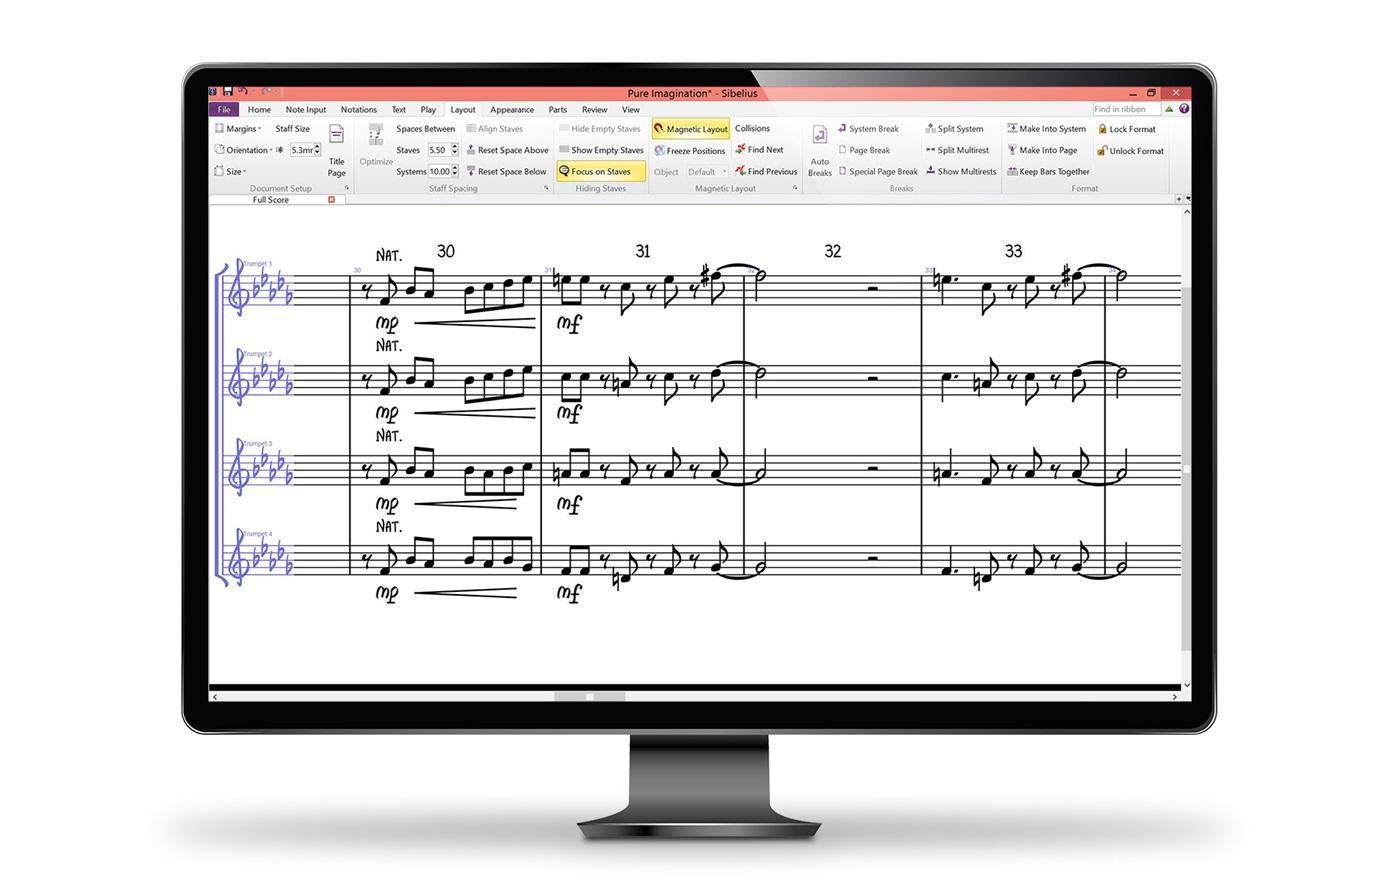 Sibelius_Overview_Main